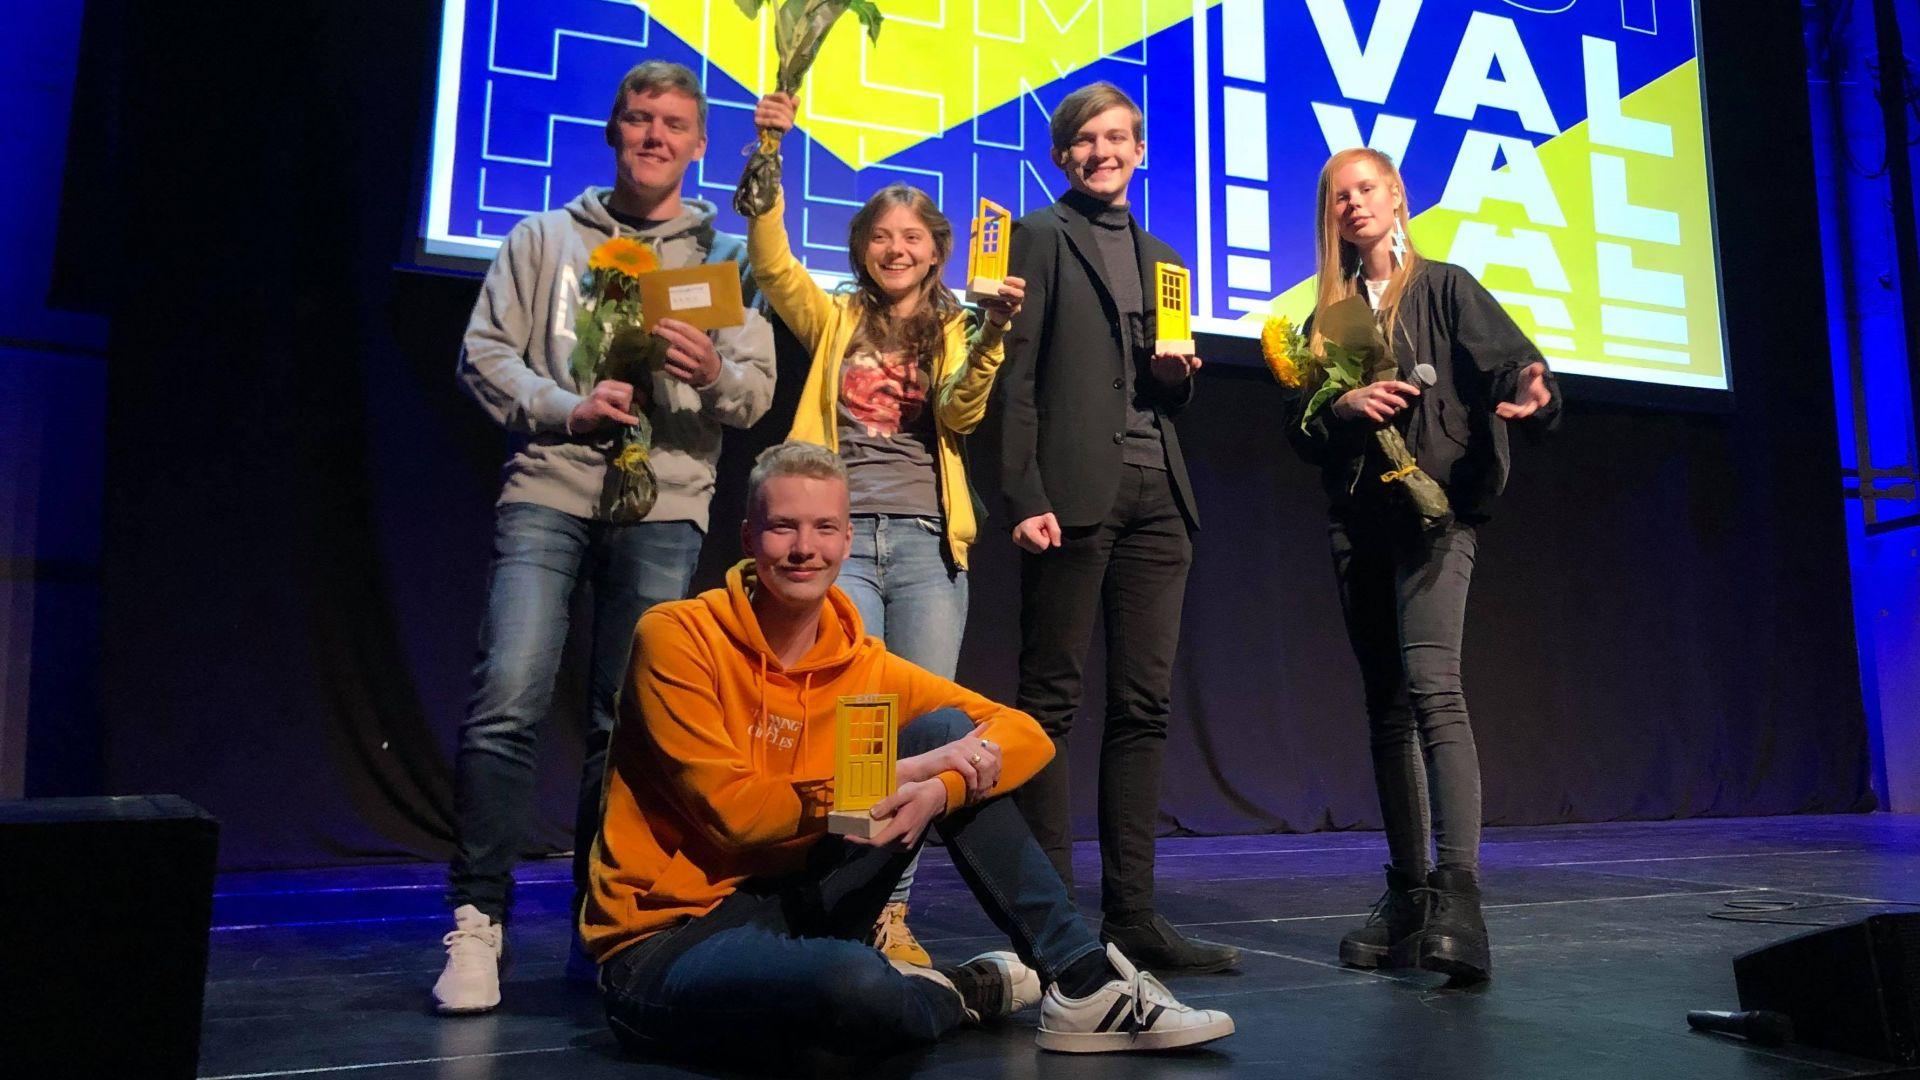 Elever på Estet-Media vann i år igen på Exit Filmfestival